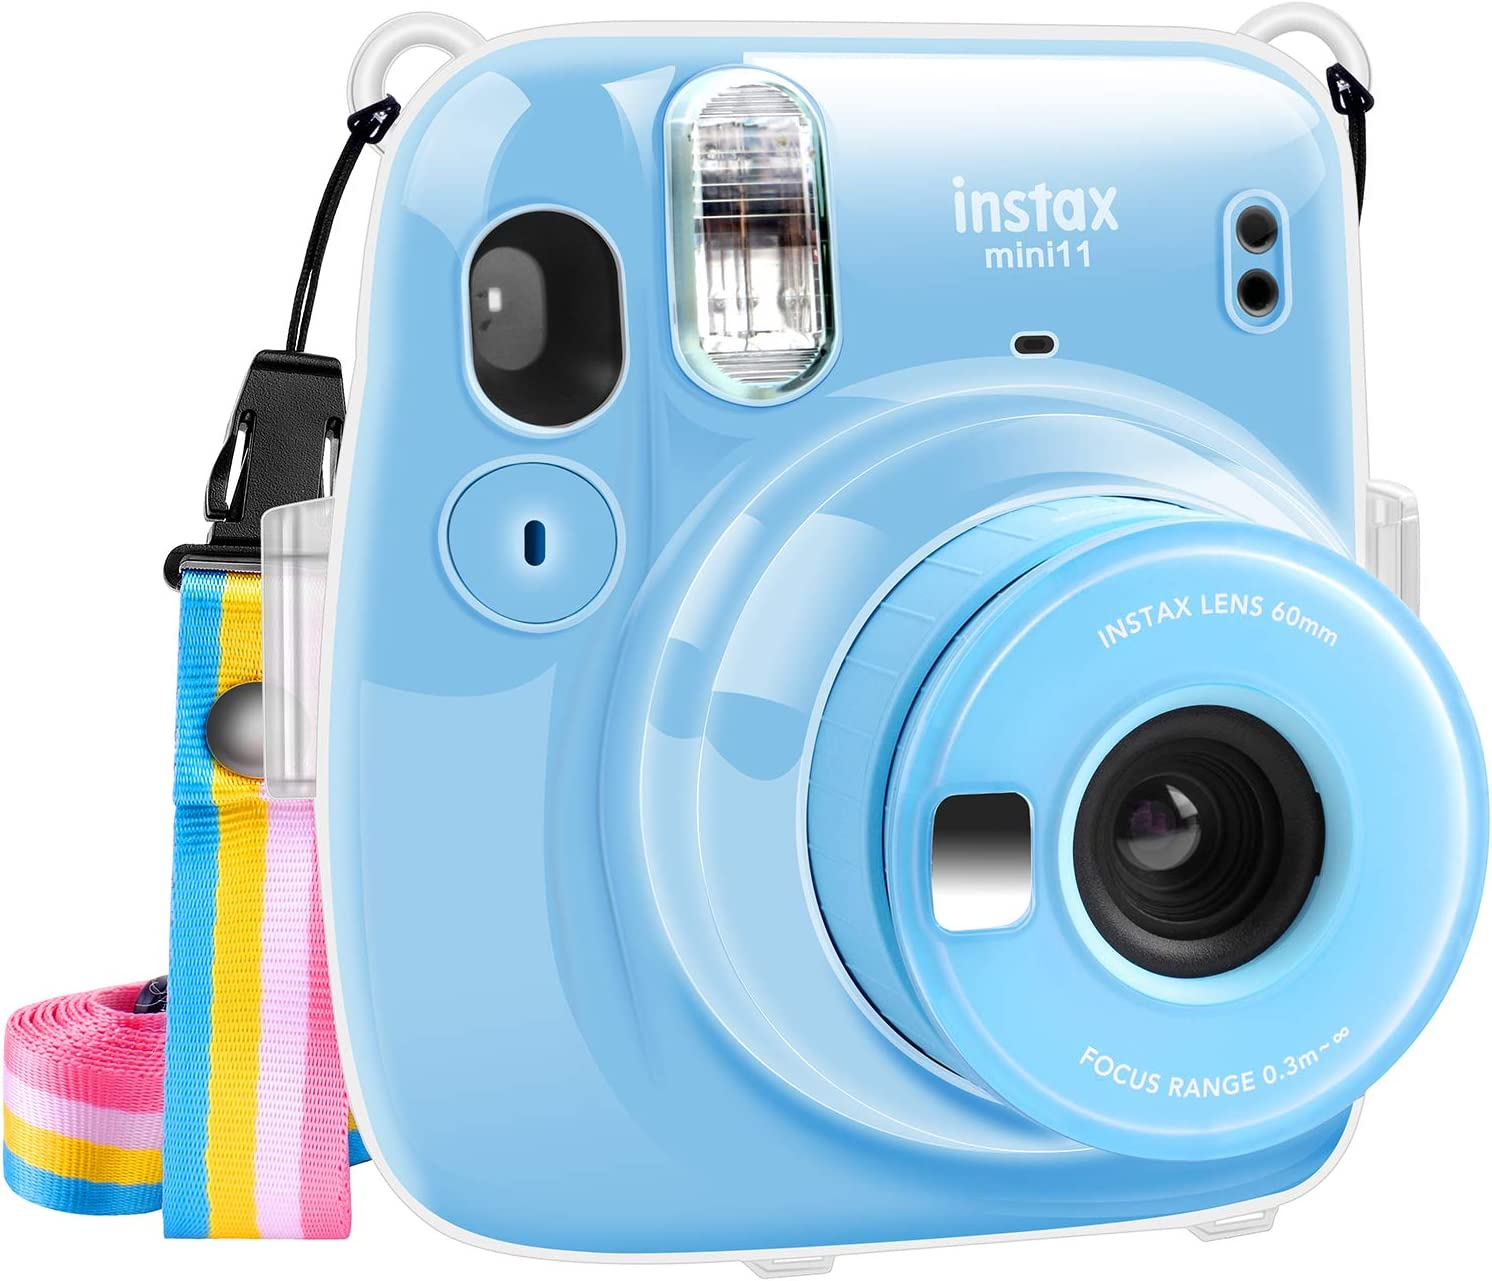 Max 84% OFF Katia Crystal Camera Case for Fujifilm Mini Instant High quality new Instax Fi 11